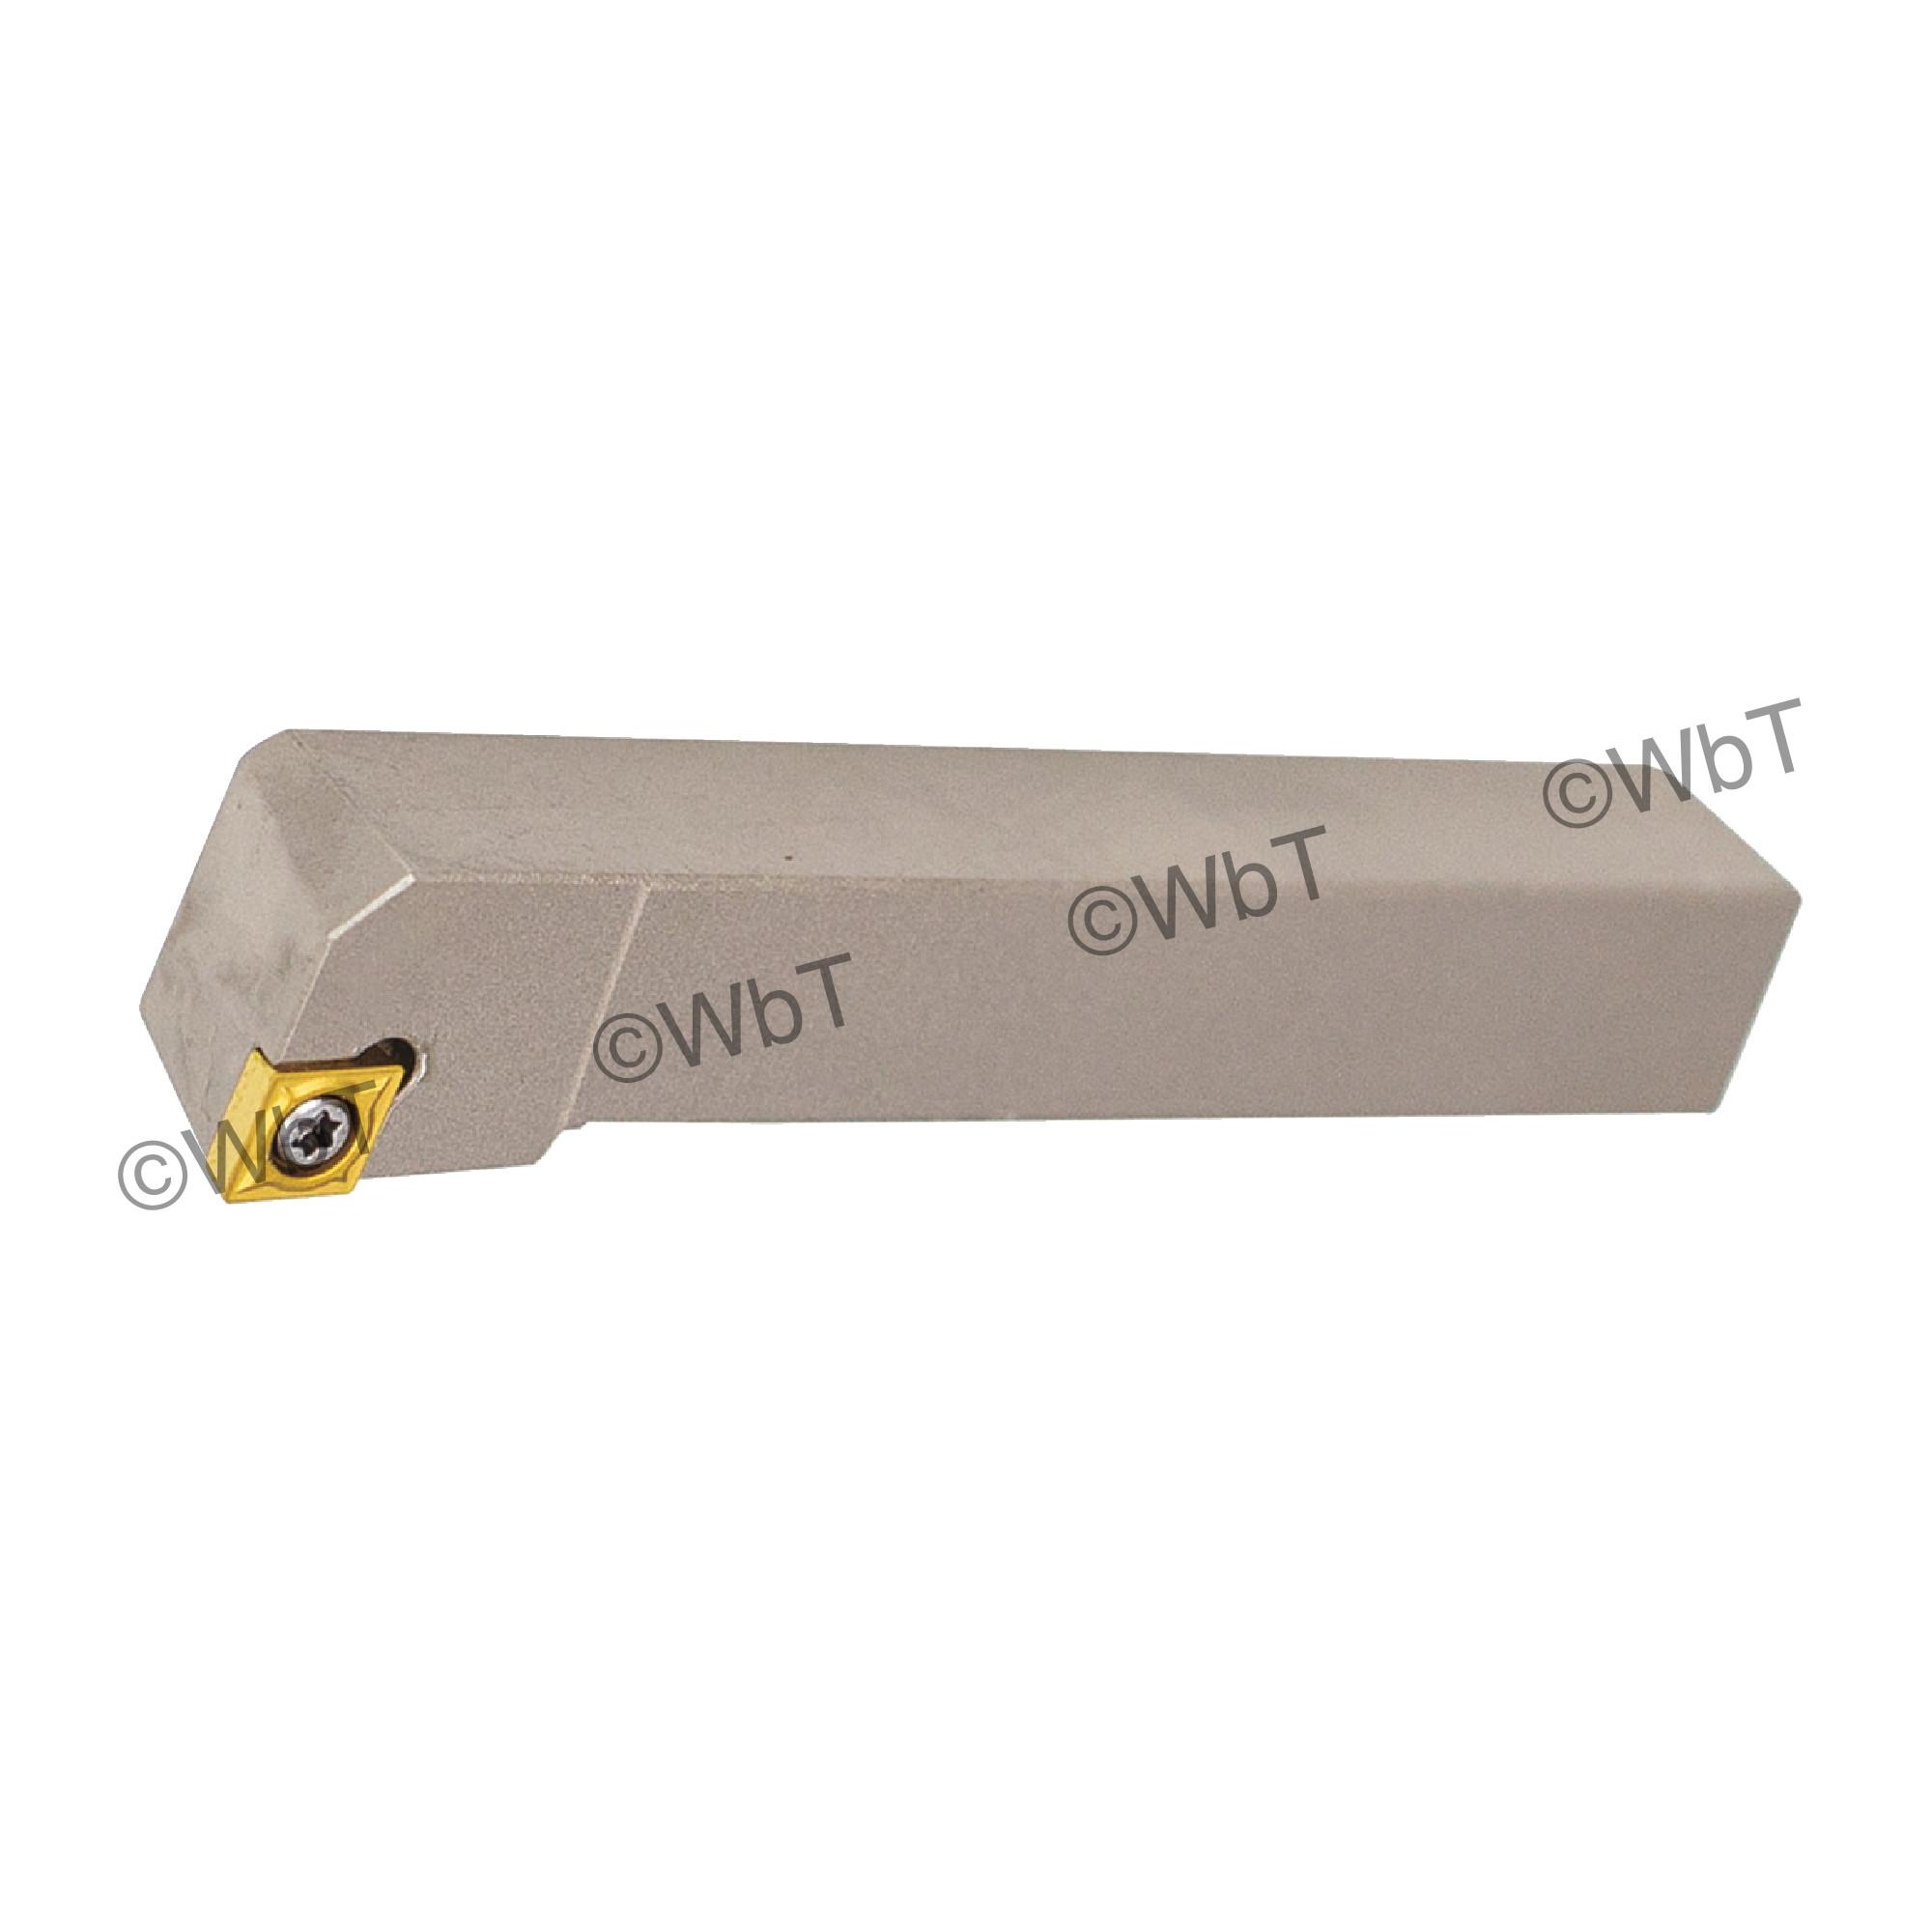 "AKUMA - SCLCR08-2K / 1/2"" Shank Holder for CCMT2(1.5)_ / Right Hand"